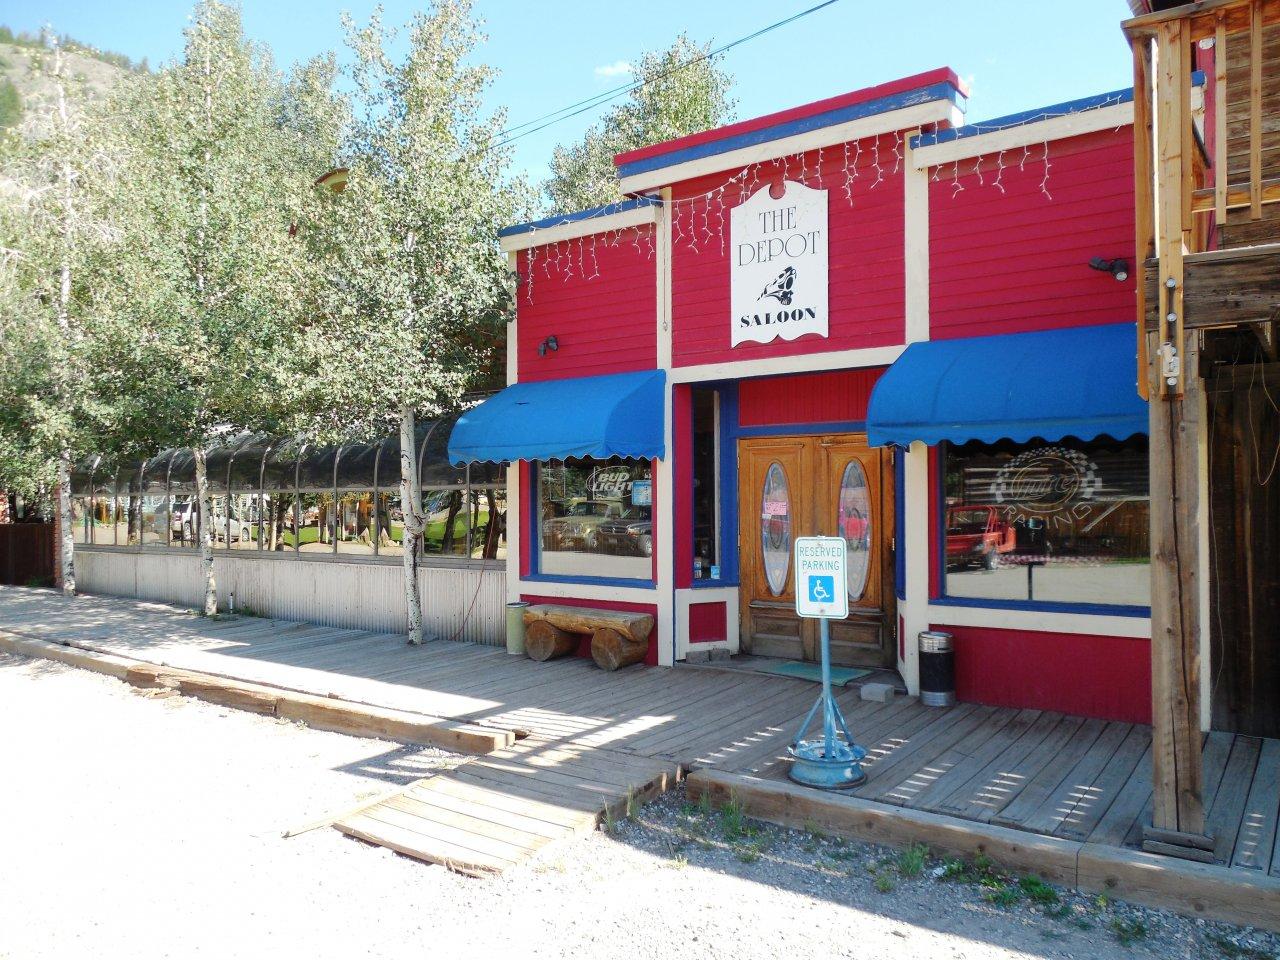 20140809_K_The Depot Saloon.jpg